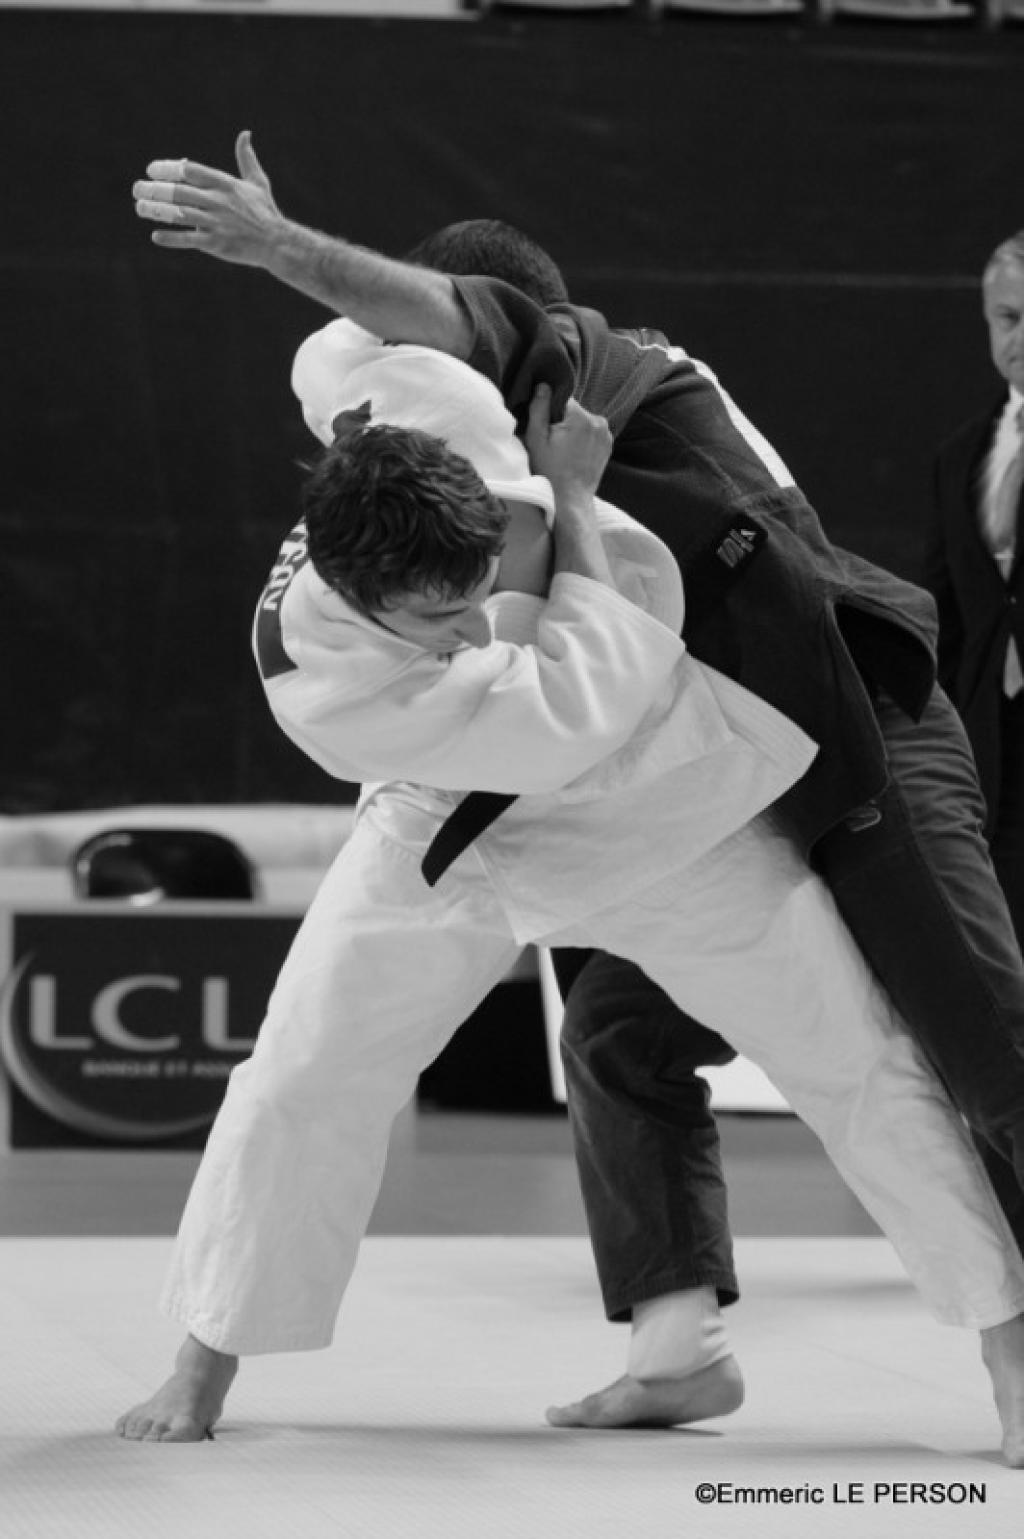 Russian men and French women take gold in Lyon